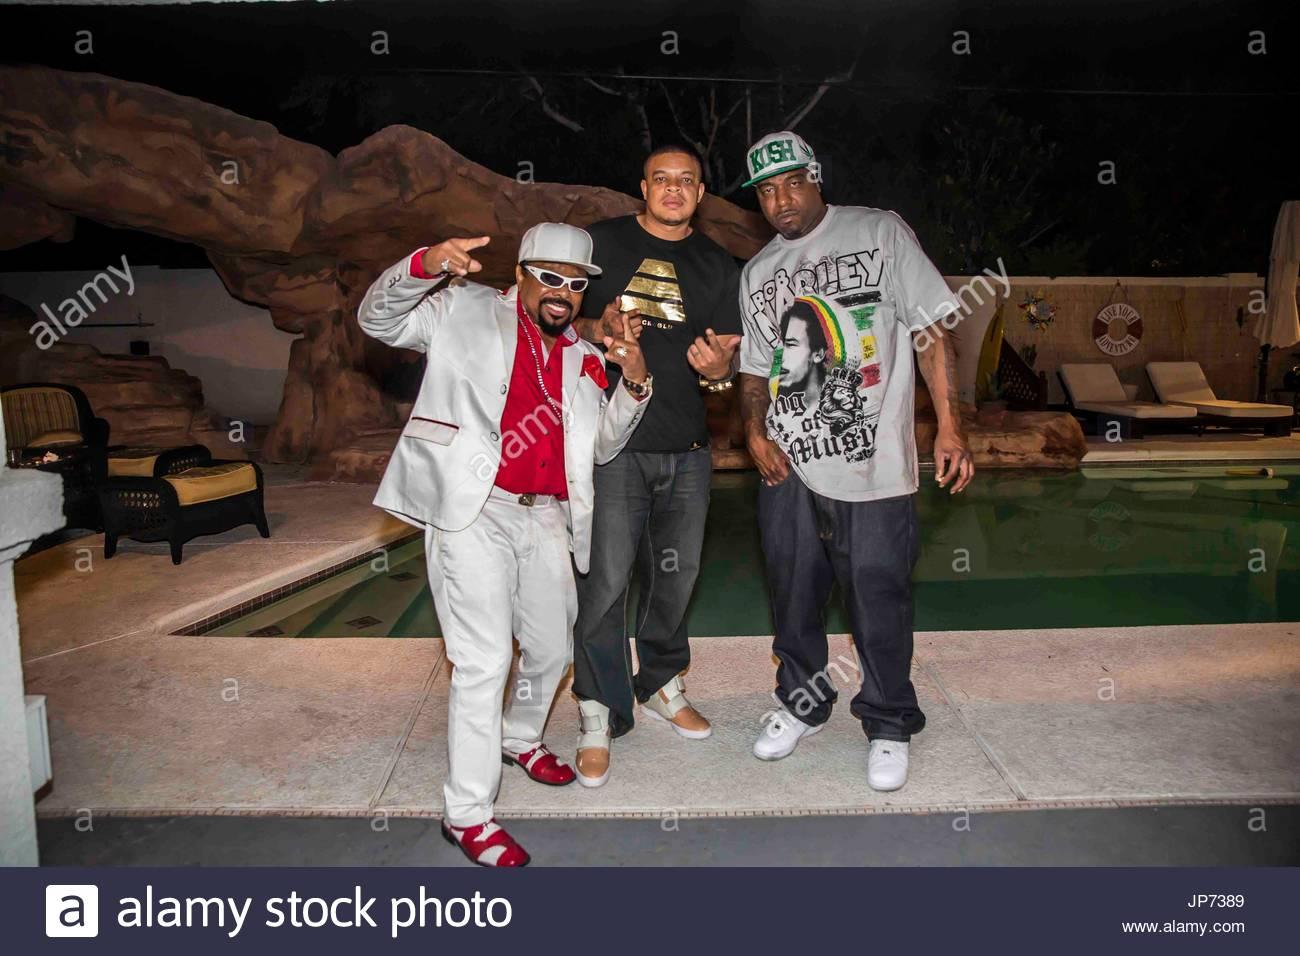 legendary bay area based rapper spice 1 parliament funkadelic s